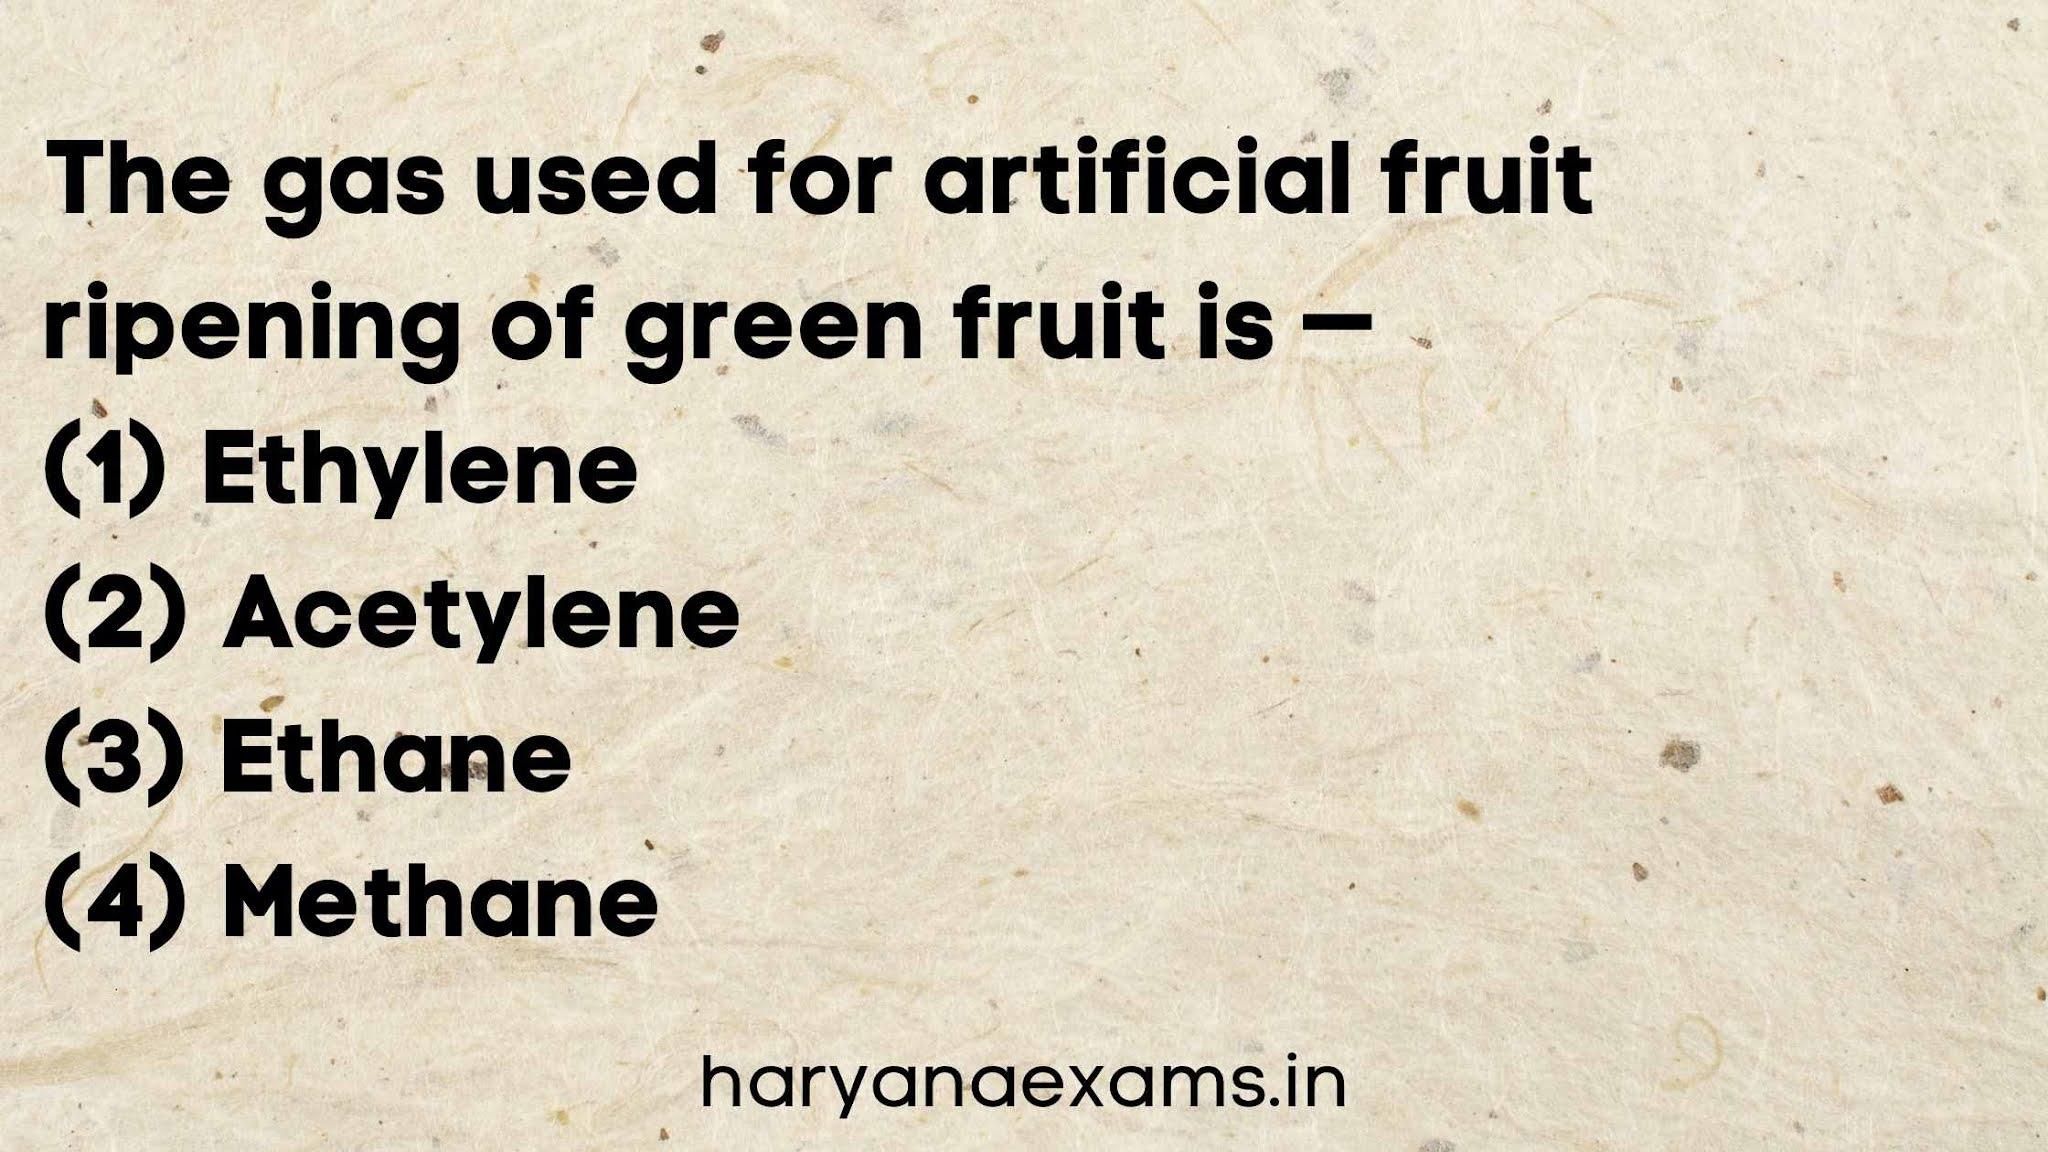 The gas used for artificial fruit ripening of green fruit is —   (1) Ethylene   (2) Acetylene   (3) Ethane   (4) Methane